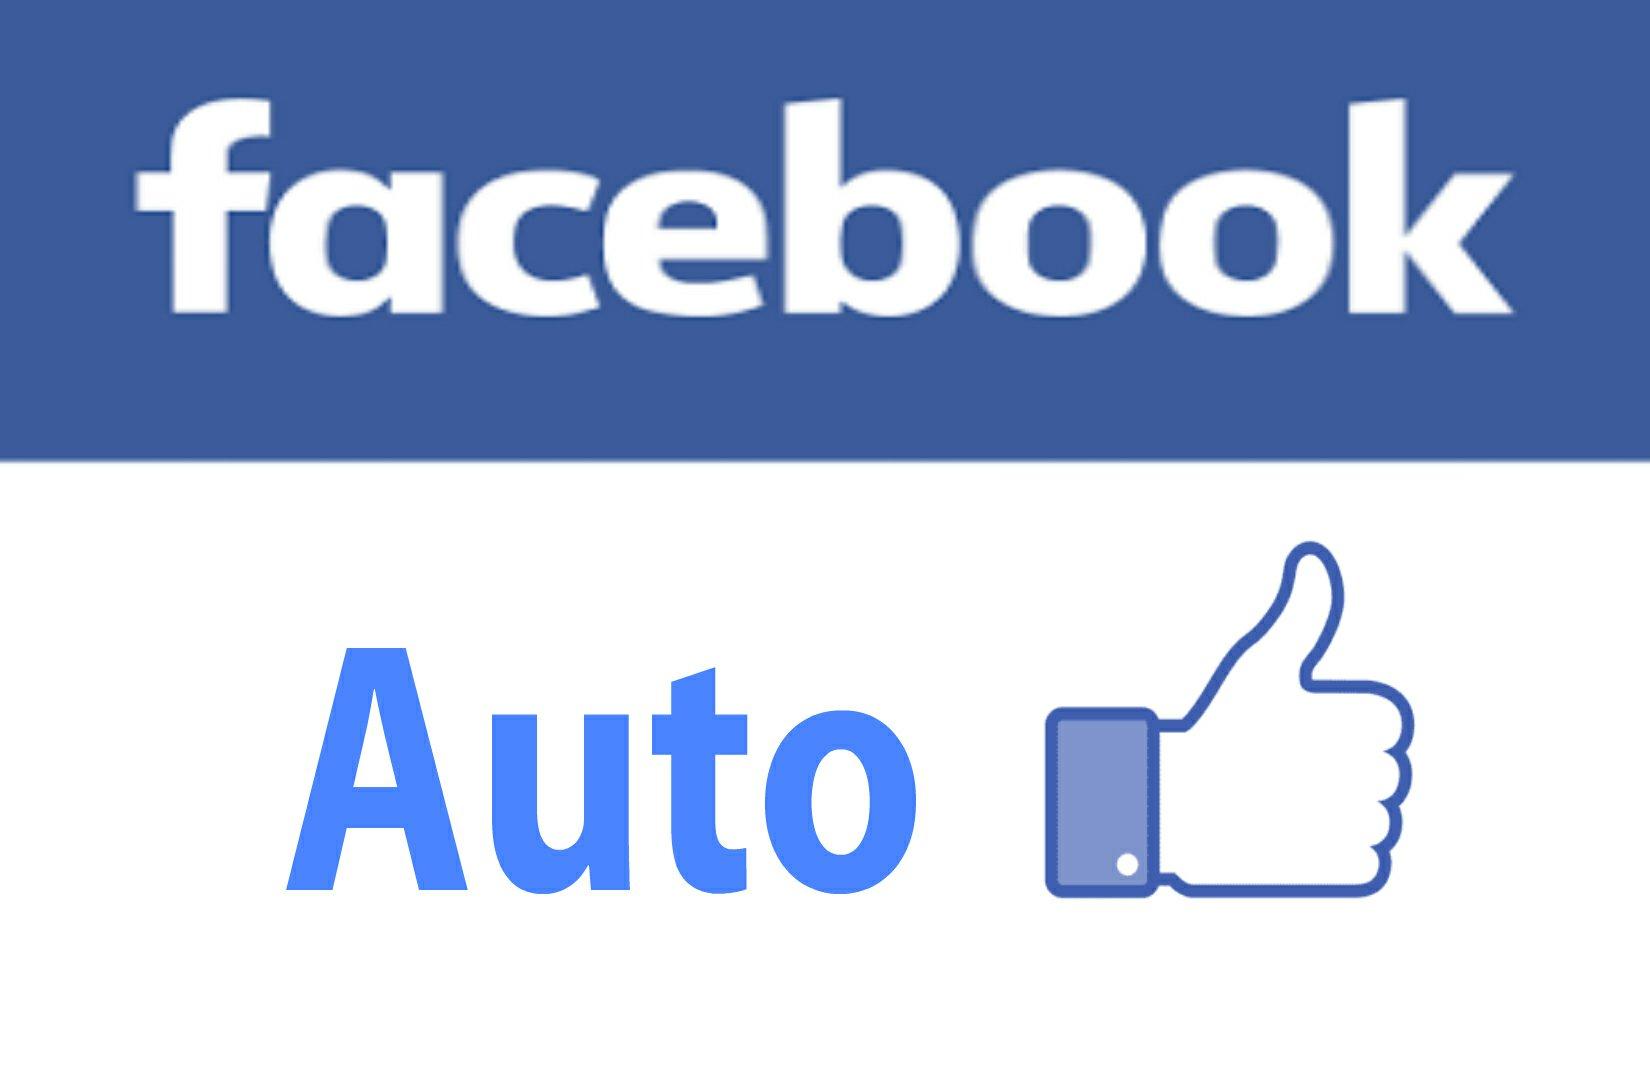 facebook-auto-likes